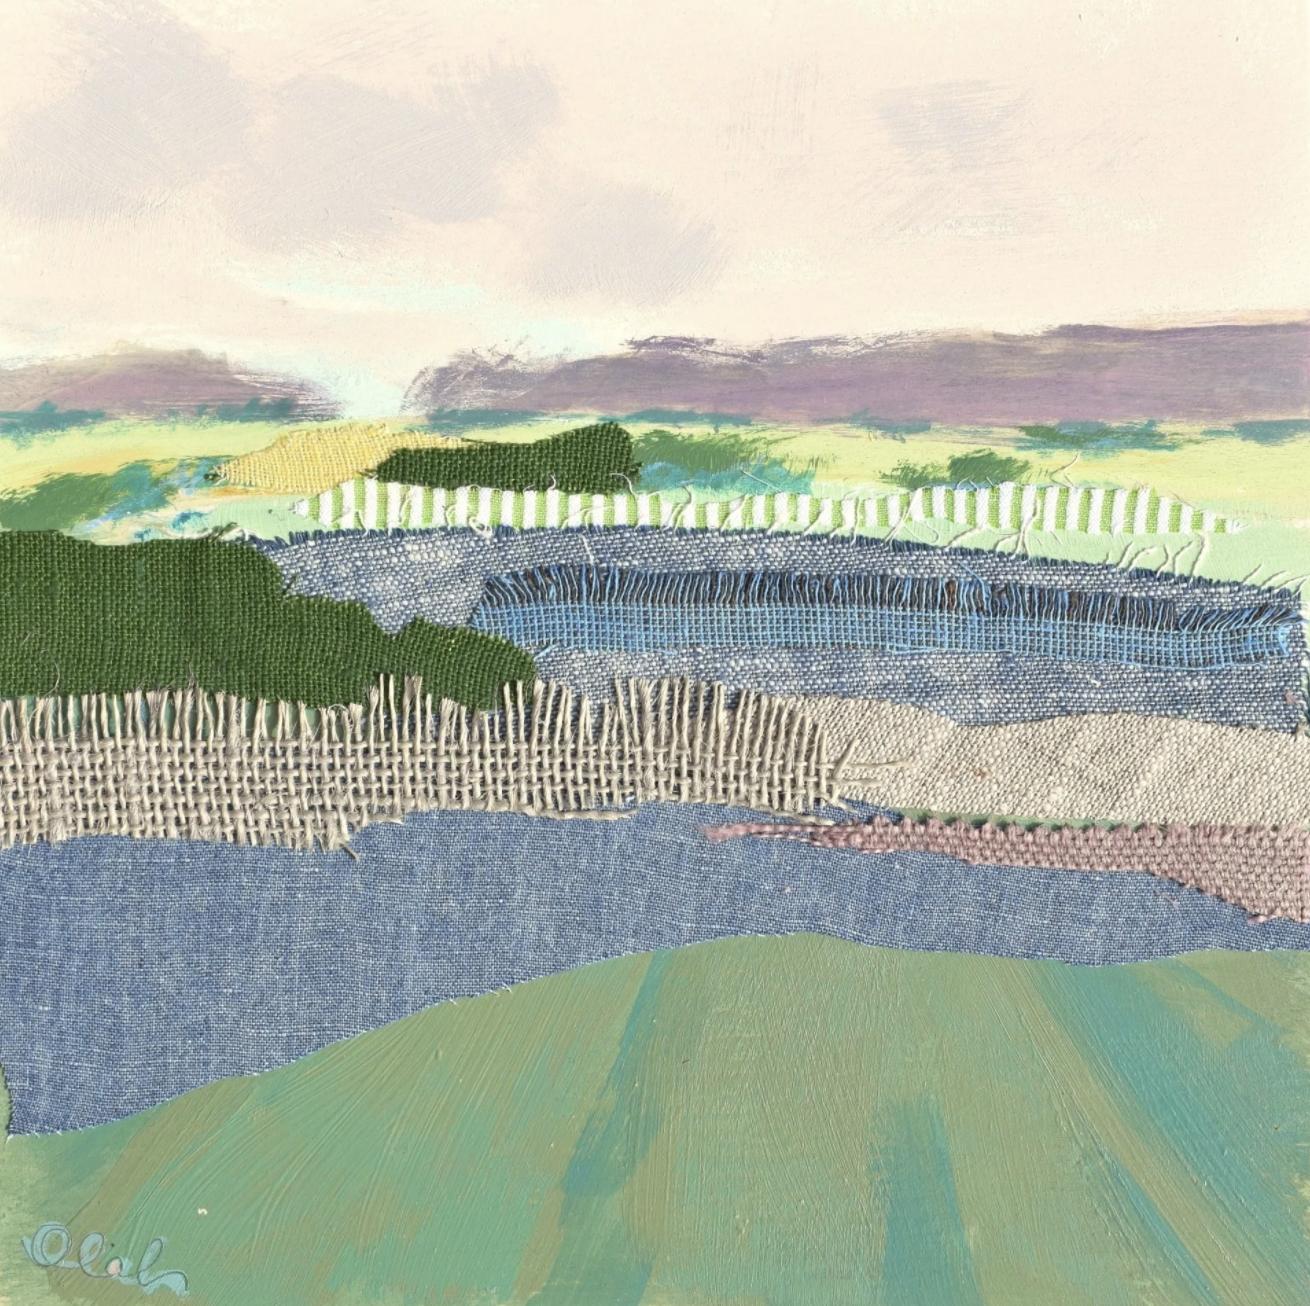 Karin Olah paintings